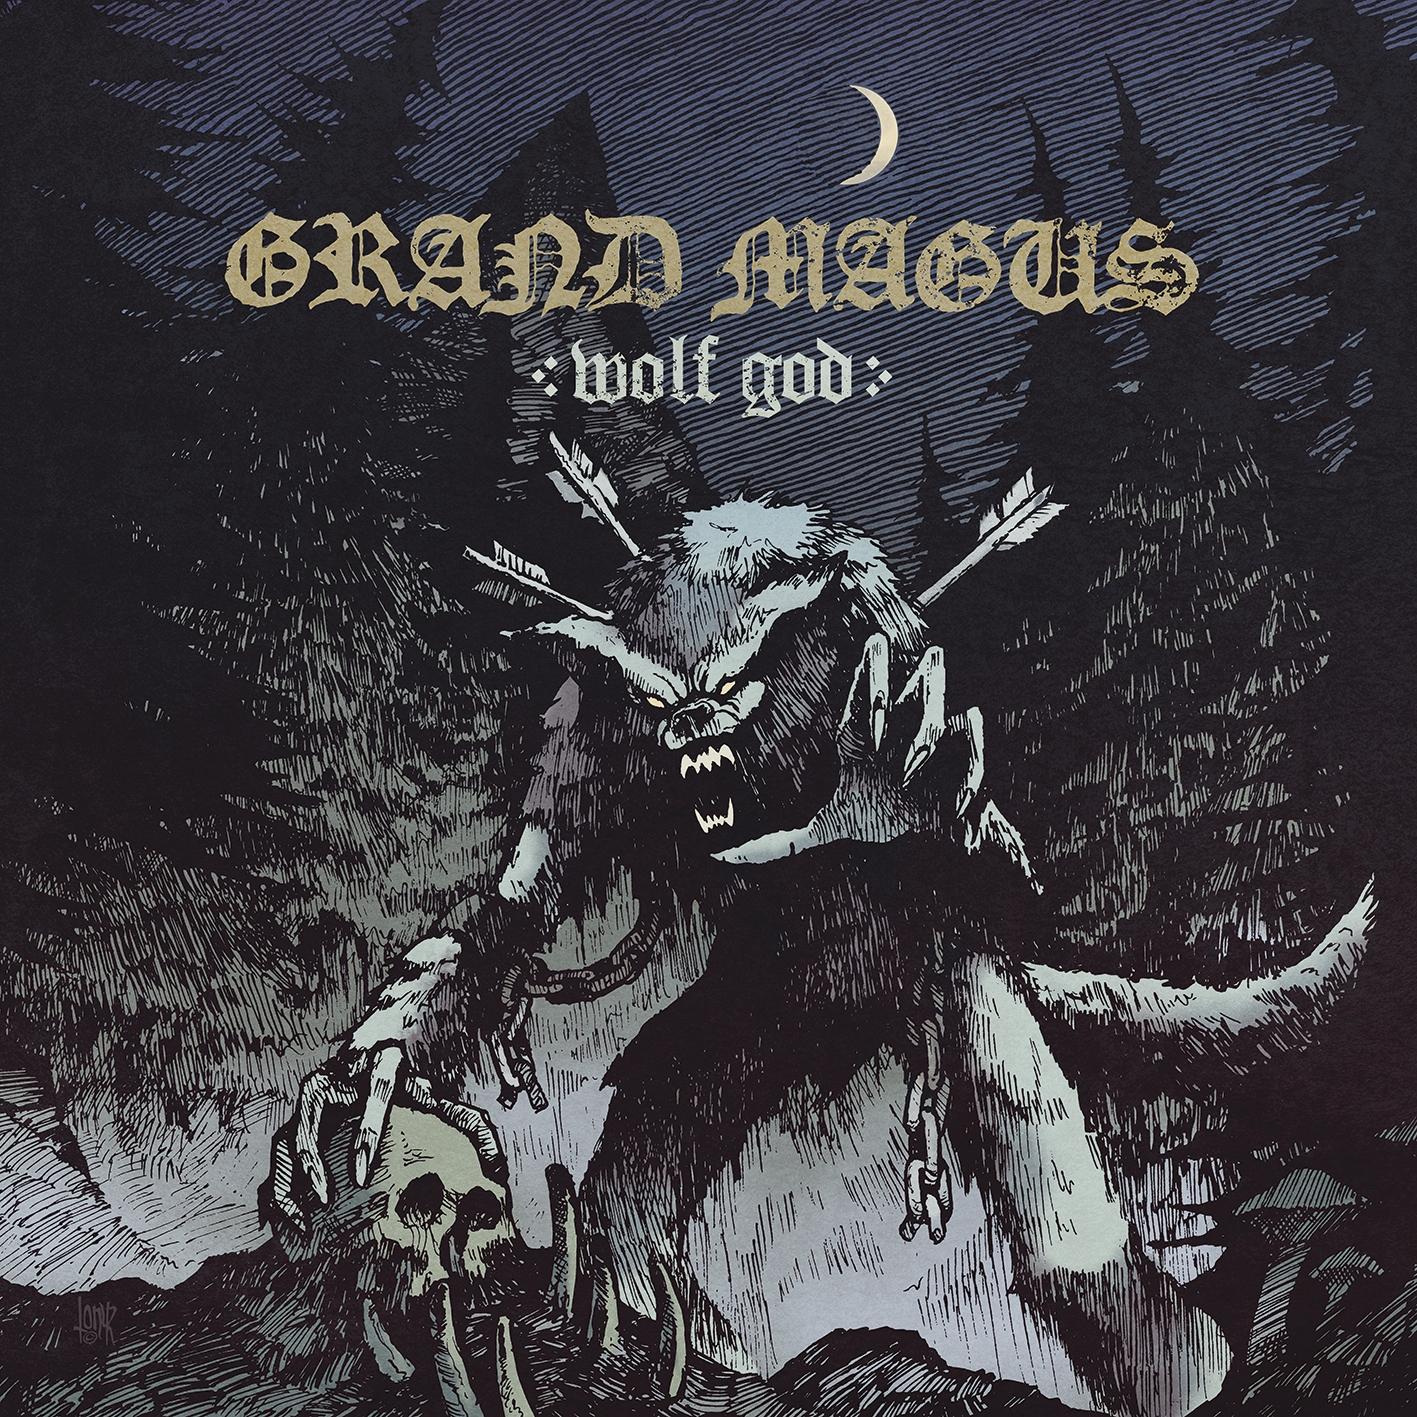 grand-magus-wolf-god-wikinger-im-wolfspelz-album-review